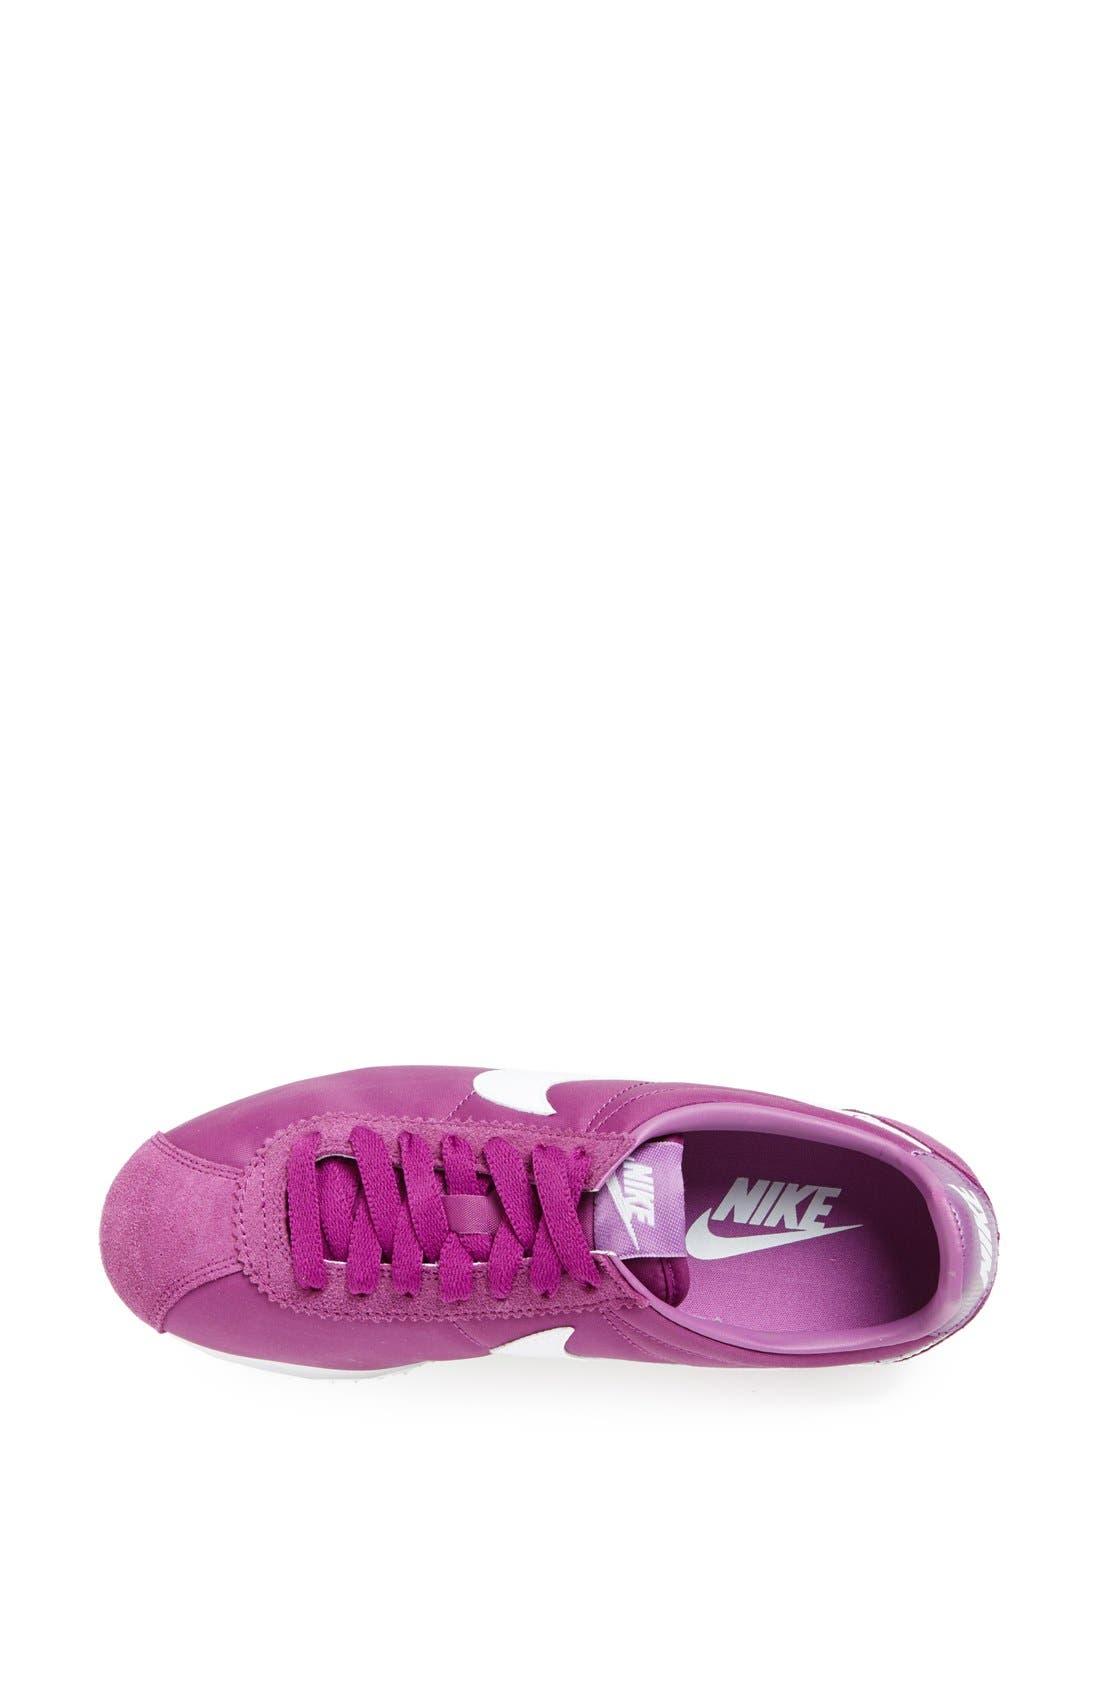 Alternate Image 3  - Nike 'Classic Cortez' Sneaker (Women)